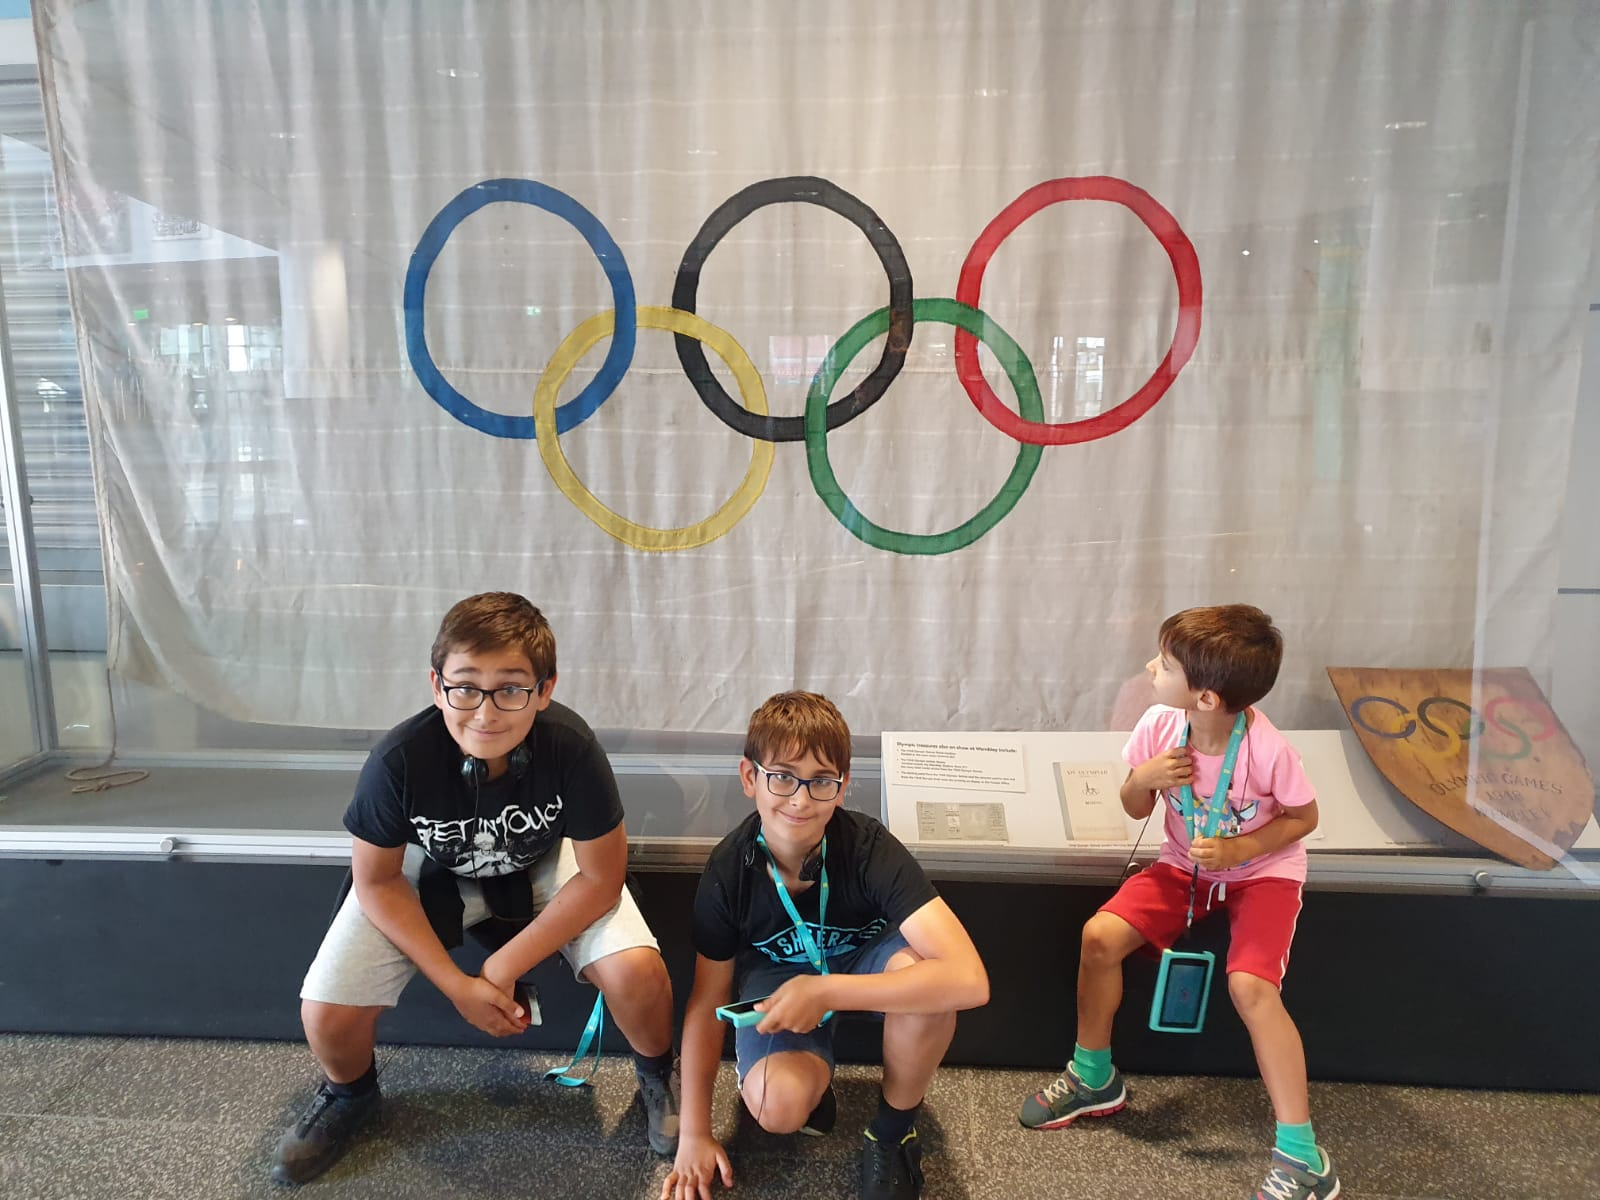 Three kids sat near the Olympics flag at Wembley Stadium